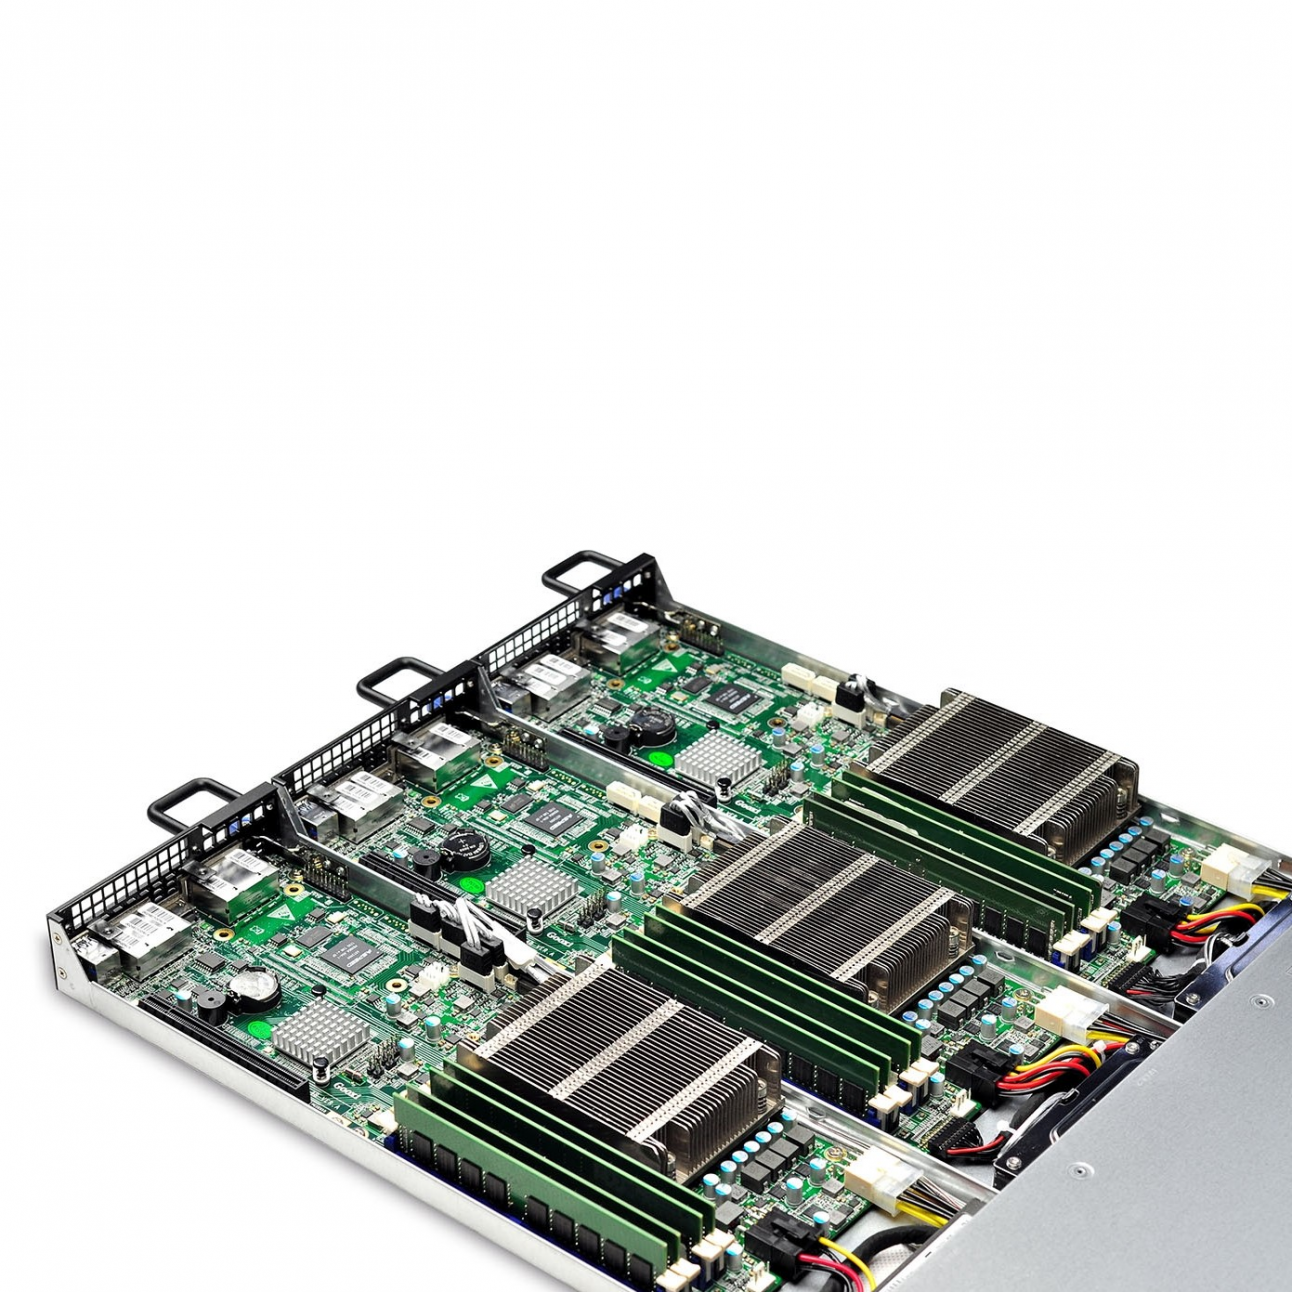 Серверная платформа 1U Barebone ,3*Nodes,6*HDD trays,Single Socket Xeon LGA1150 E3-1200v3/v4MB,500W DELTA PSU,Heatsink,Slide Rail